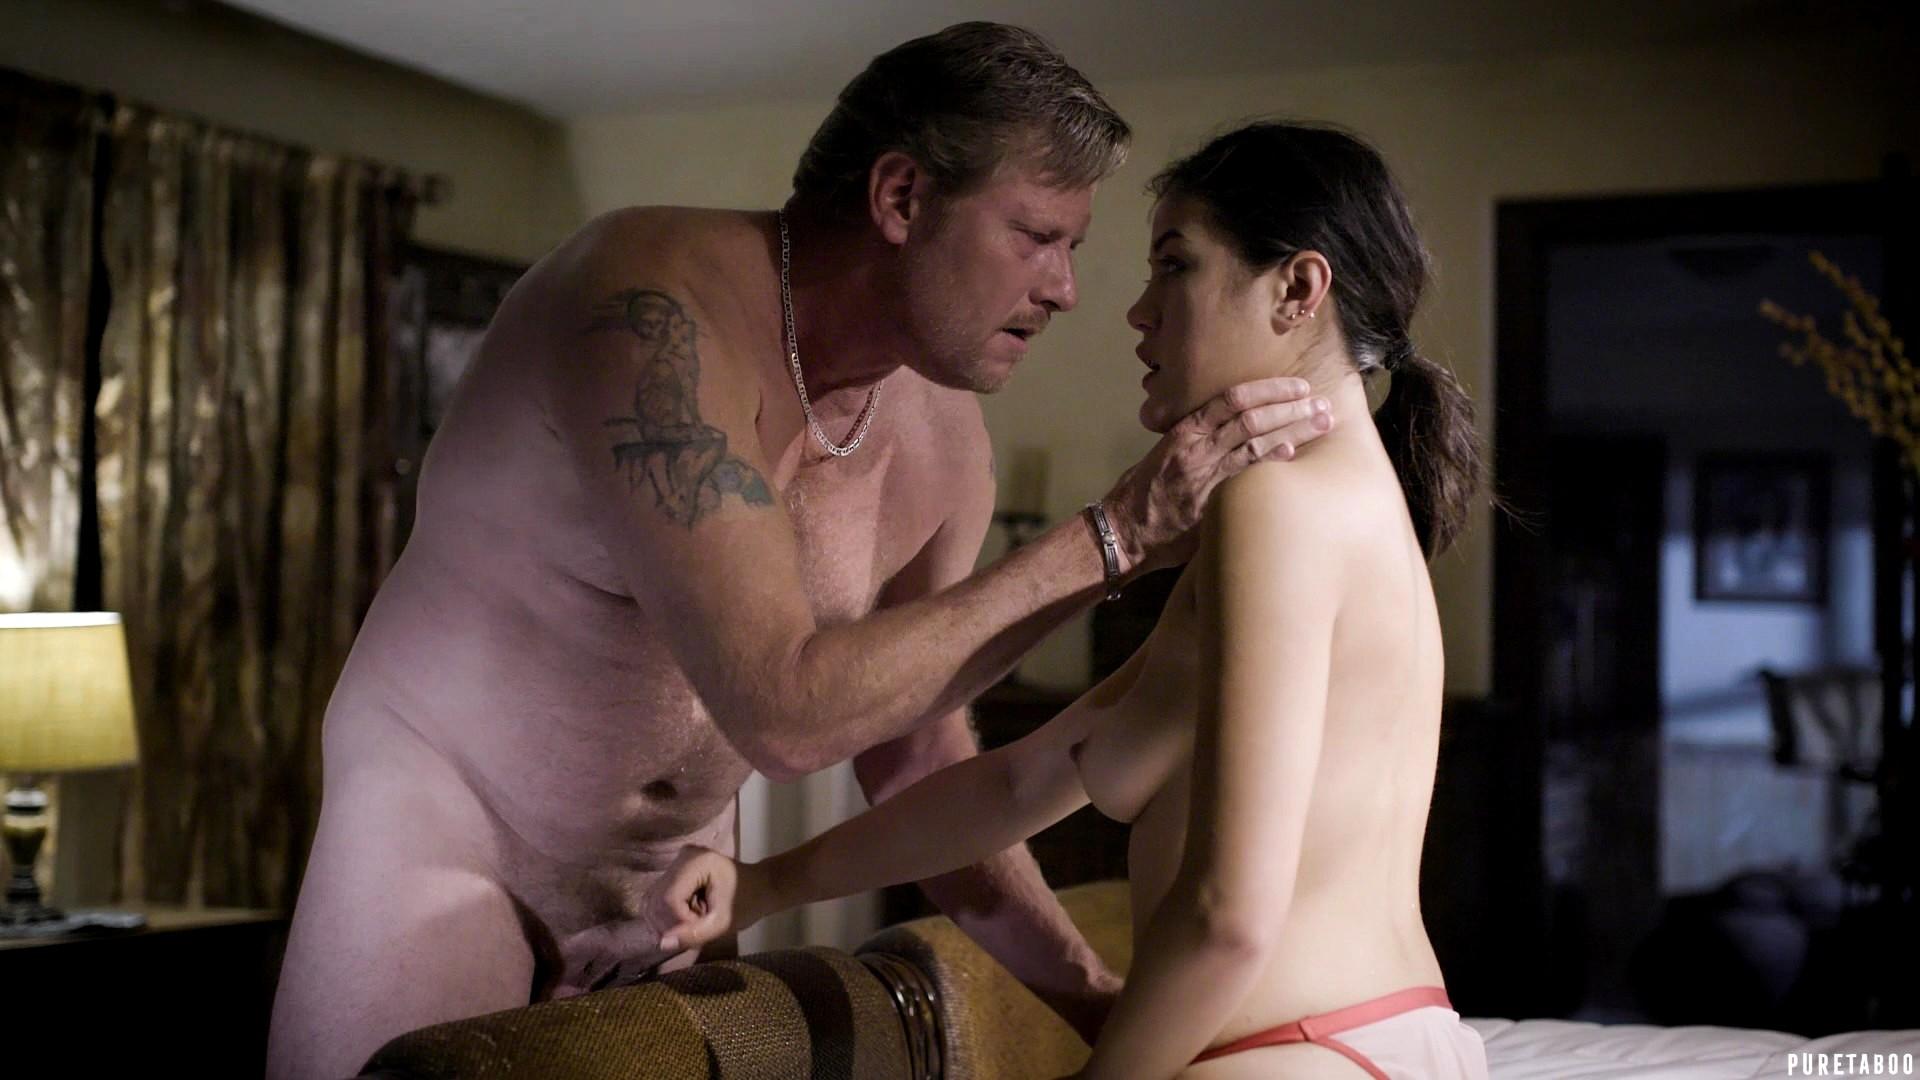 Naomi Pornstar Bio Taboo Sex Models Free Hardcore Porn Images